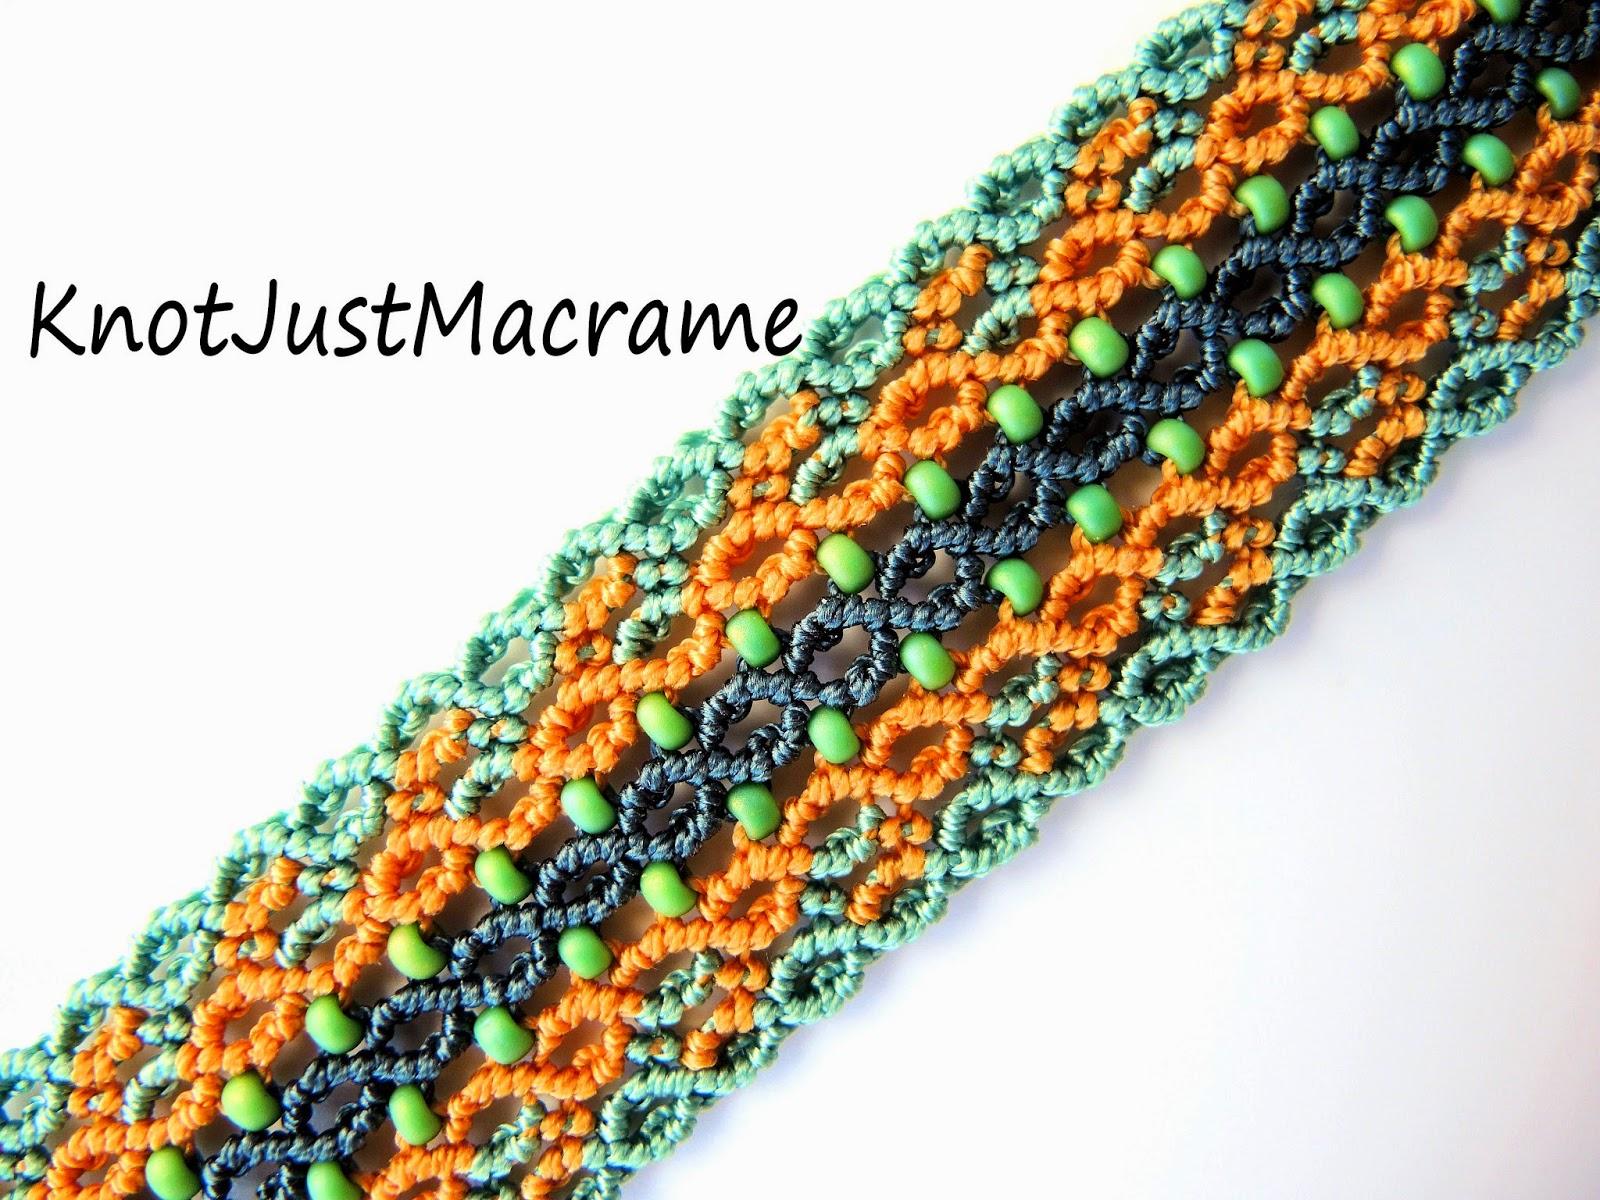 Knotted micro macrame bracelet by Sherri Stokey of Knot Just Macrame.